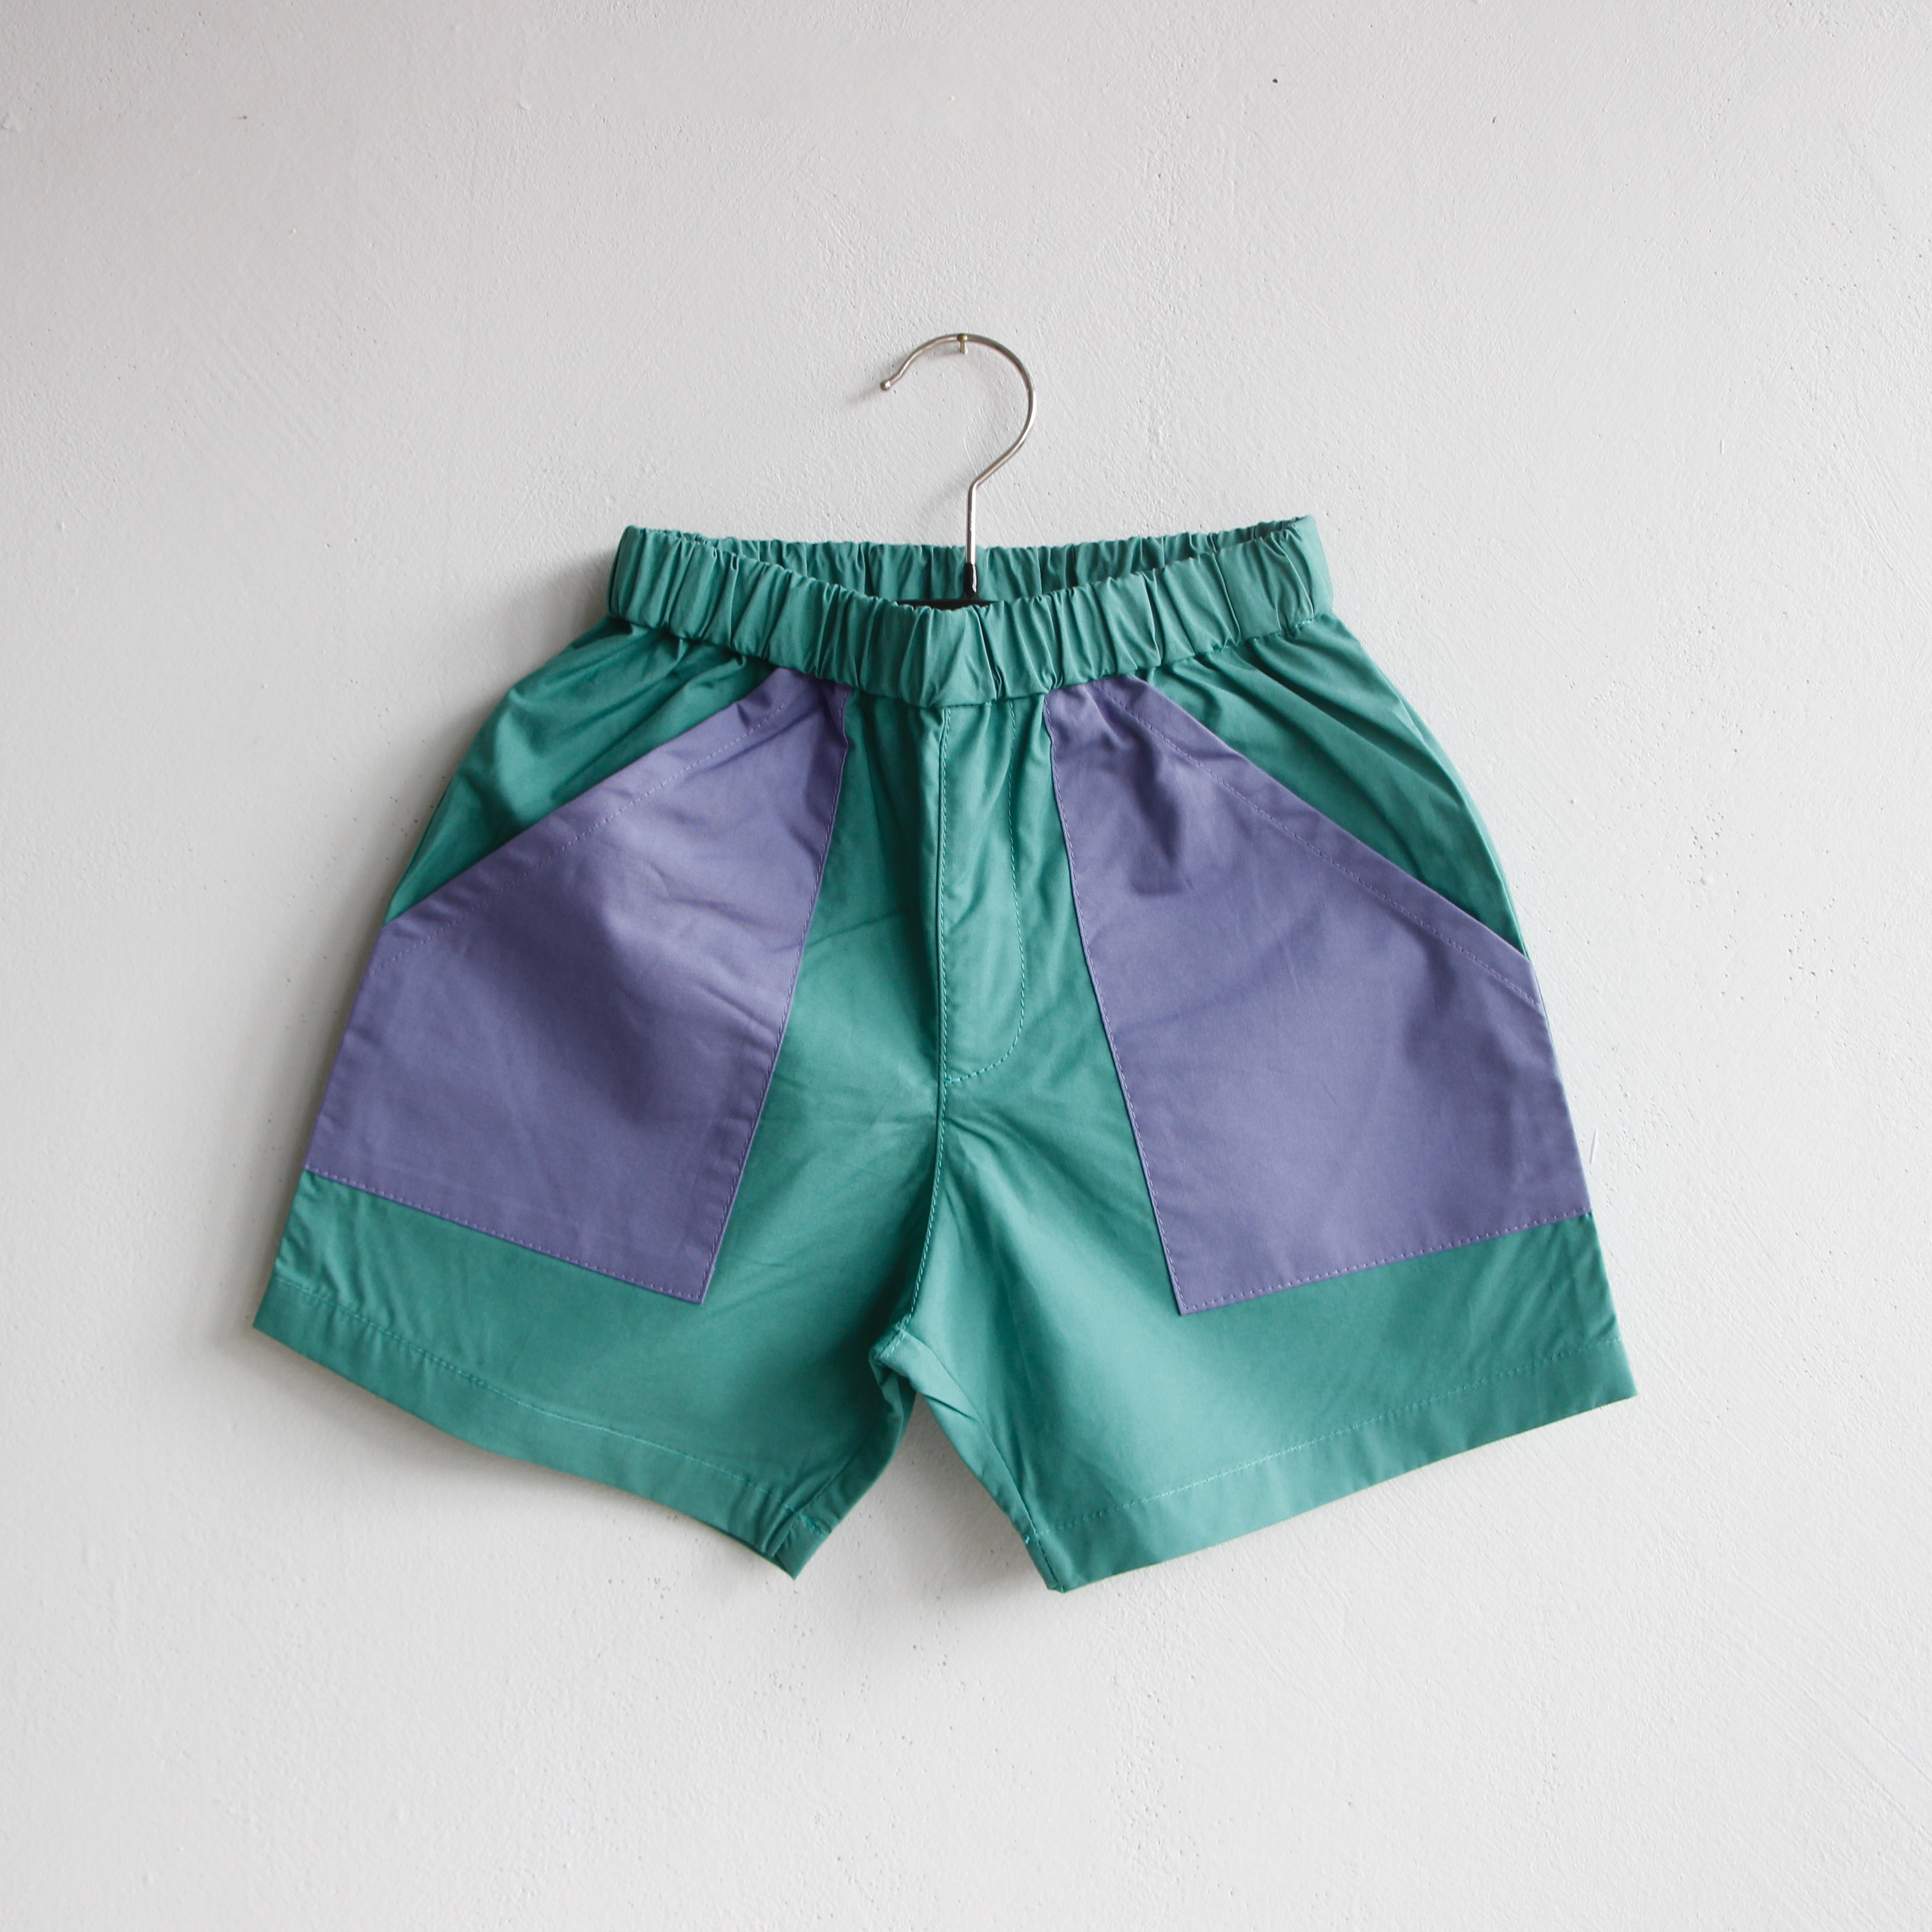 《eLfinFolk 2021SS》typwriter shorts / emerald green / 80-130cm